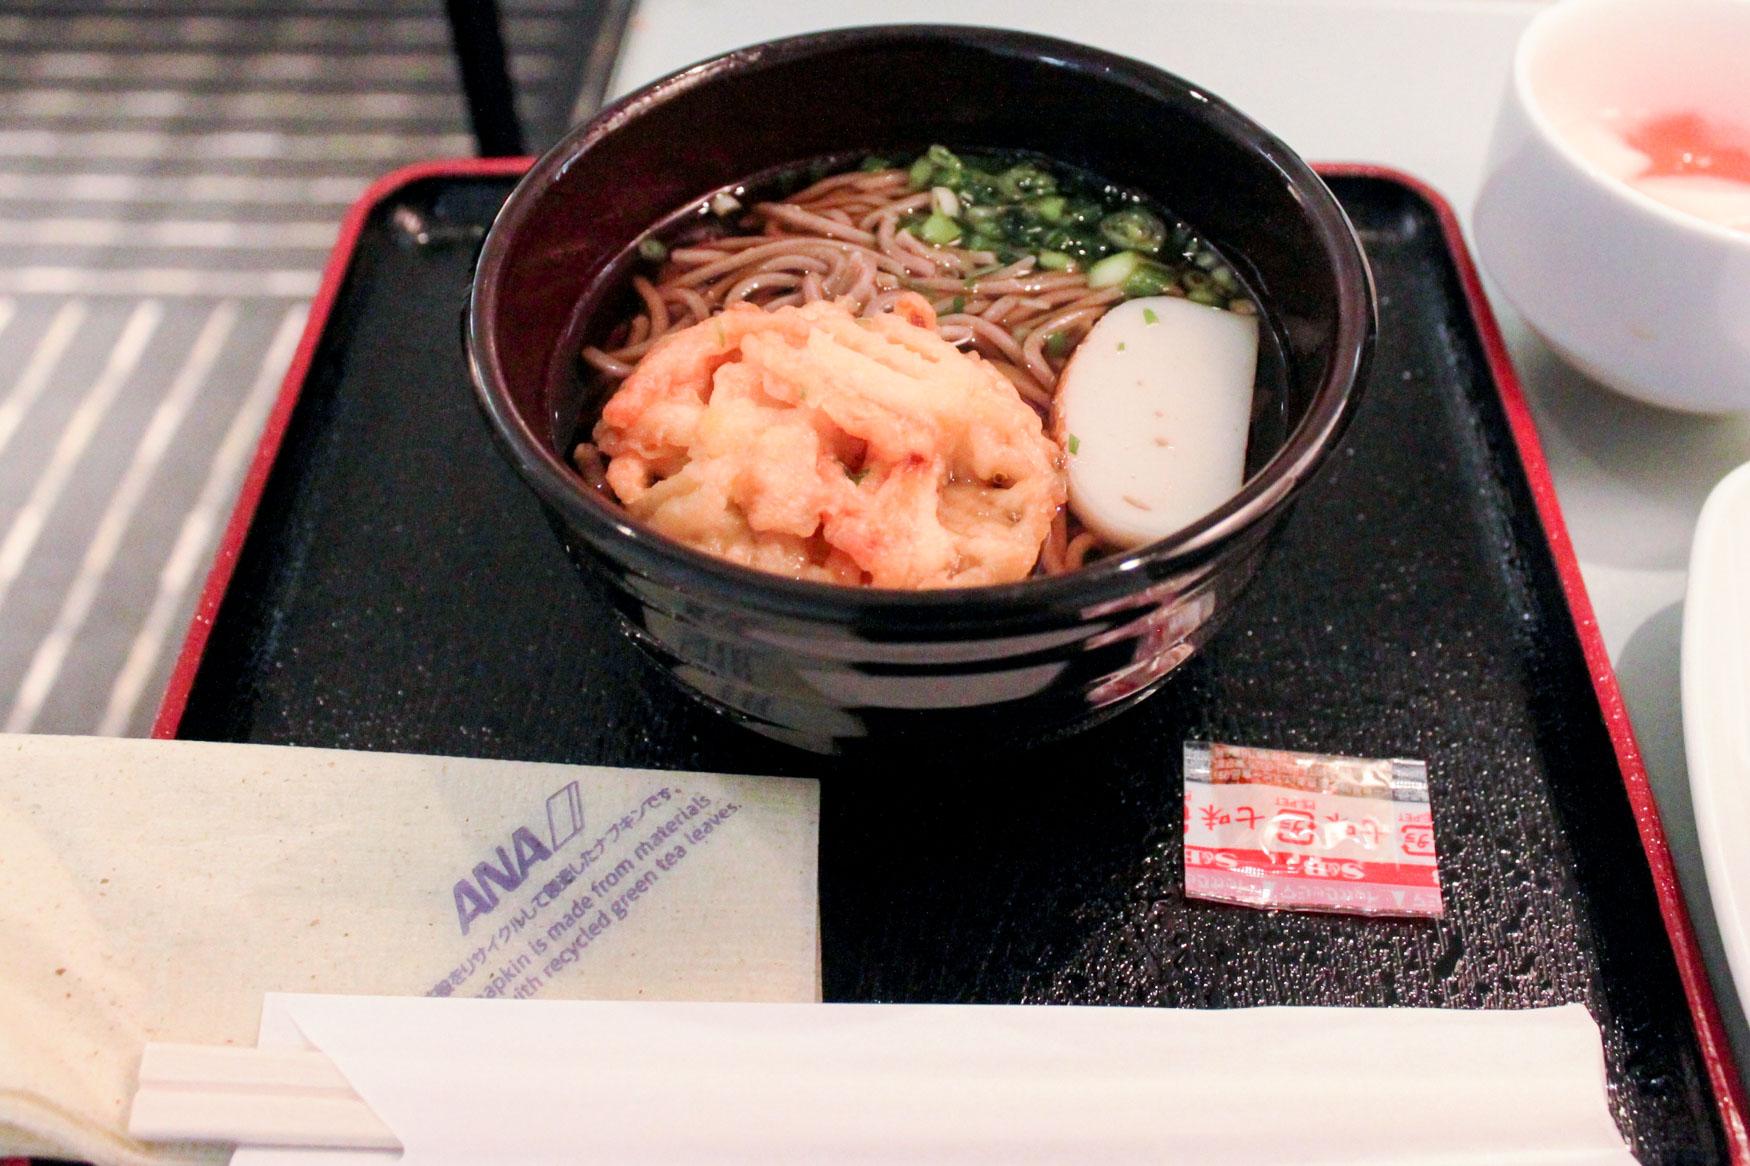 ANA Lounge Tokyo Narita Soba Noodles